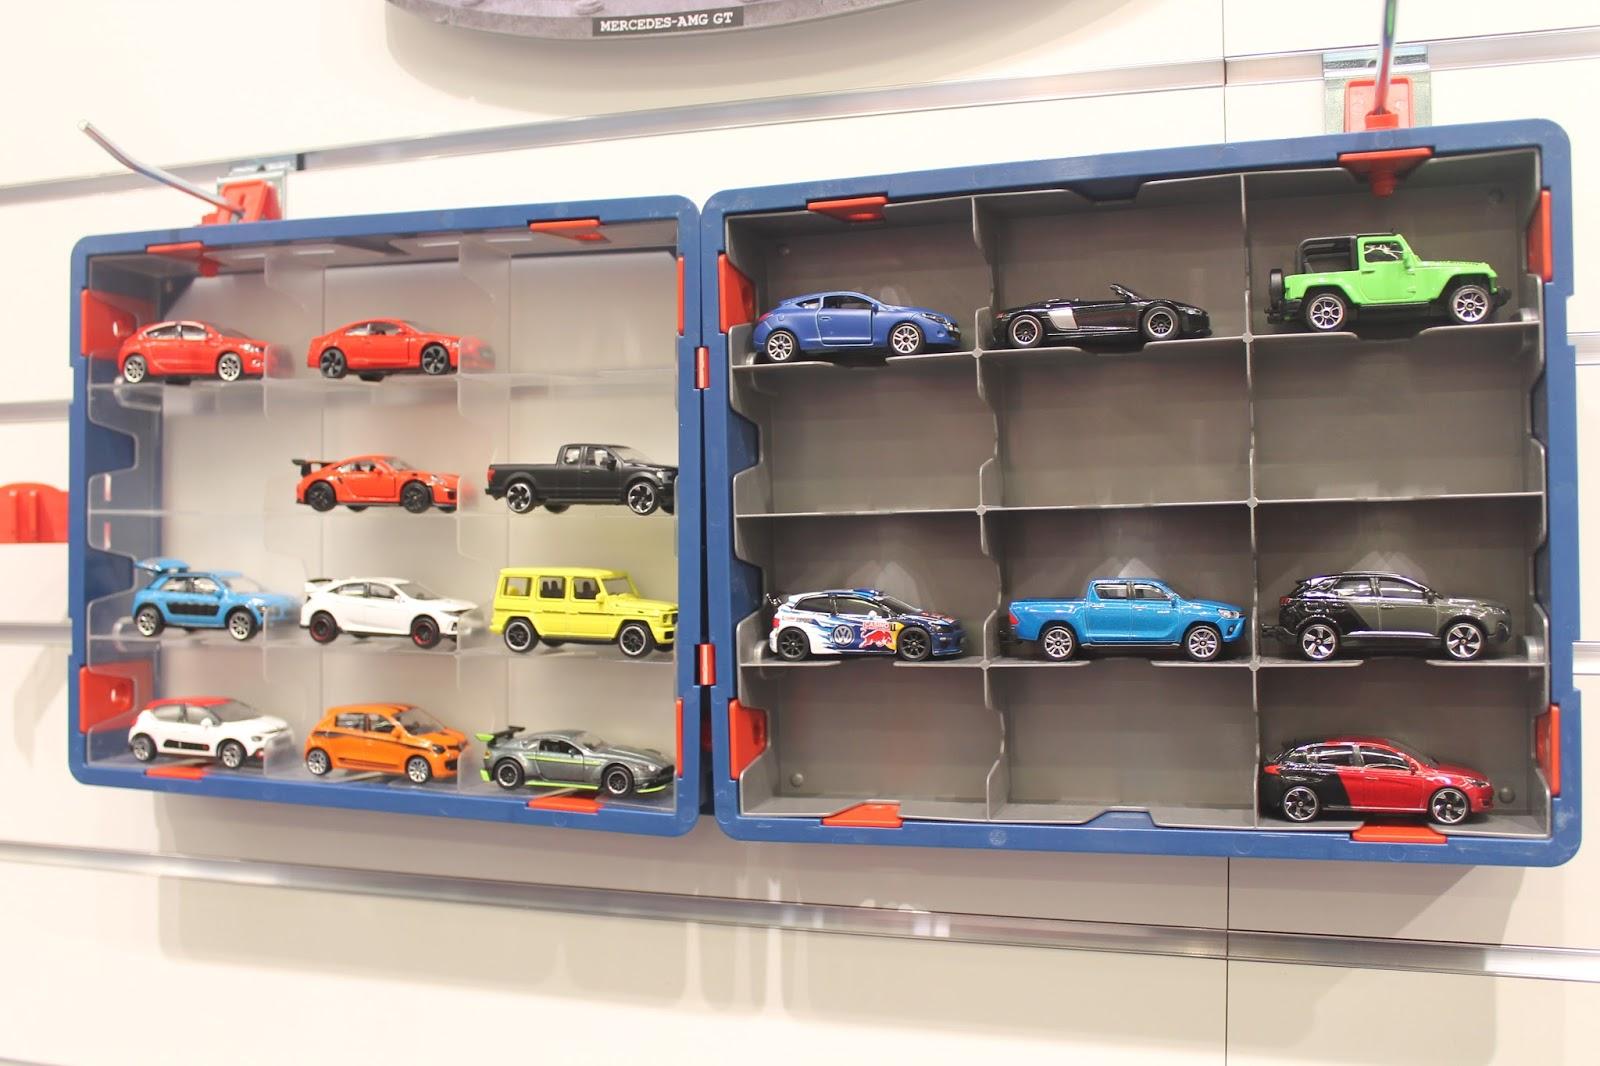 Aston Martin Gt8 >> Nuremberg 2018 : Majorette - Mininches